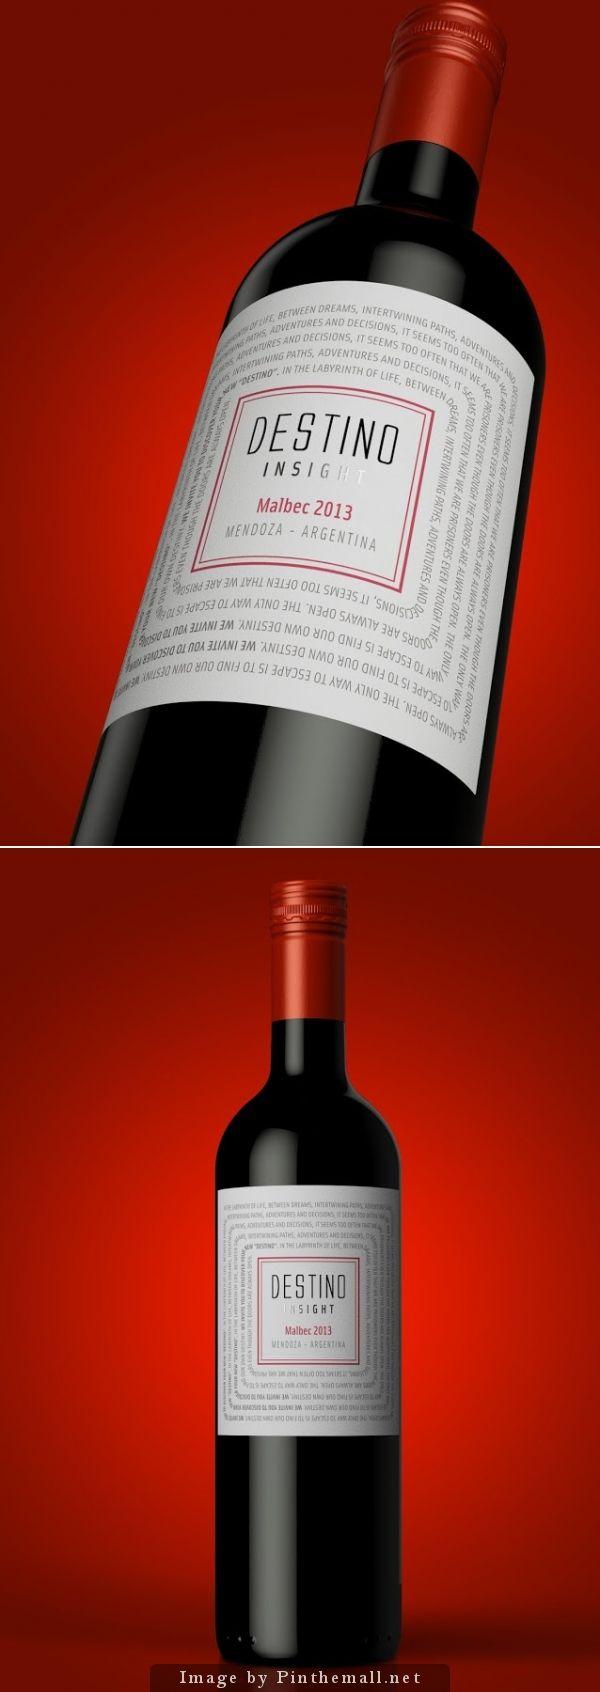 Destino Wine Packaging Design Wine Label Packaging Wine Label Design